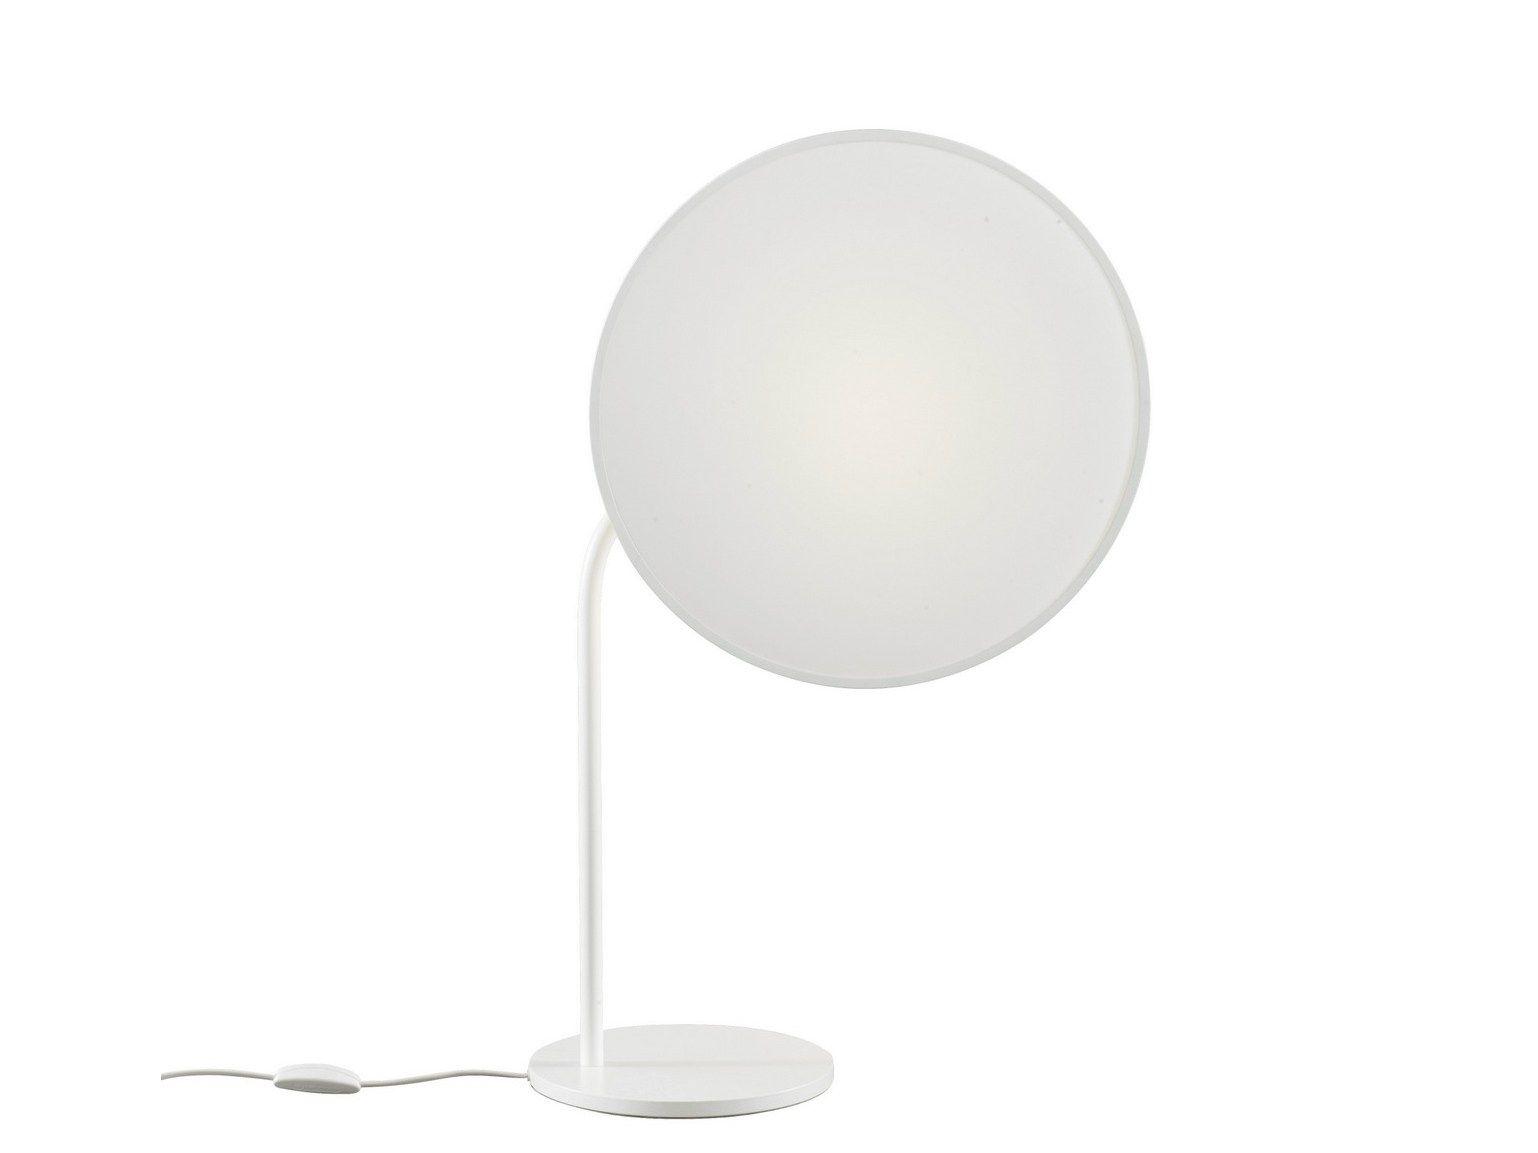 lampe de table fluorescent pivotante pour clairage indirect collection owl by roset italia. Black Bedroom Furniture Sets. Home Design Ideas